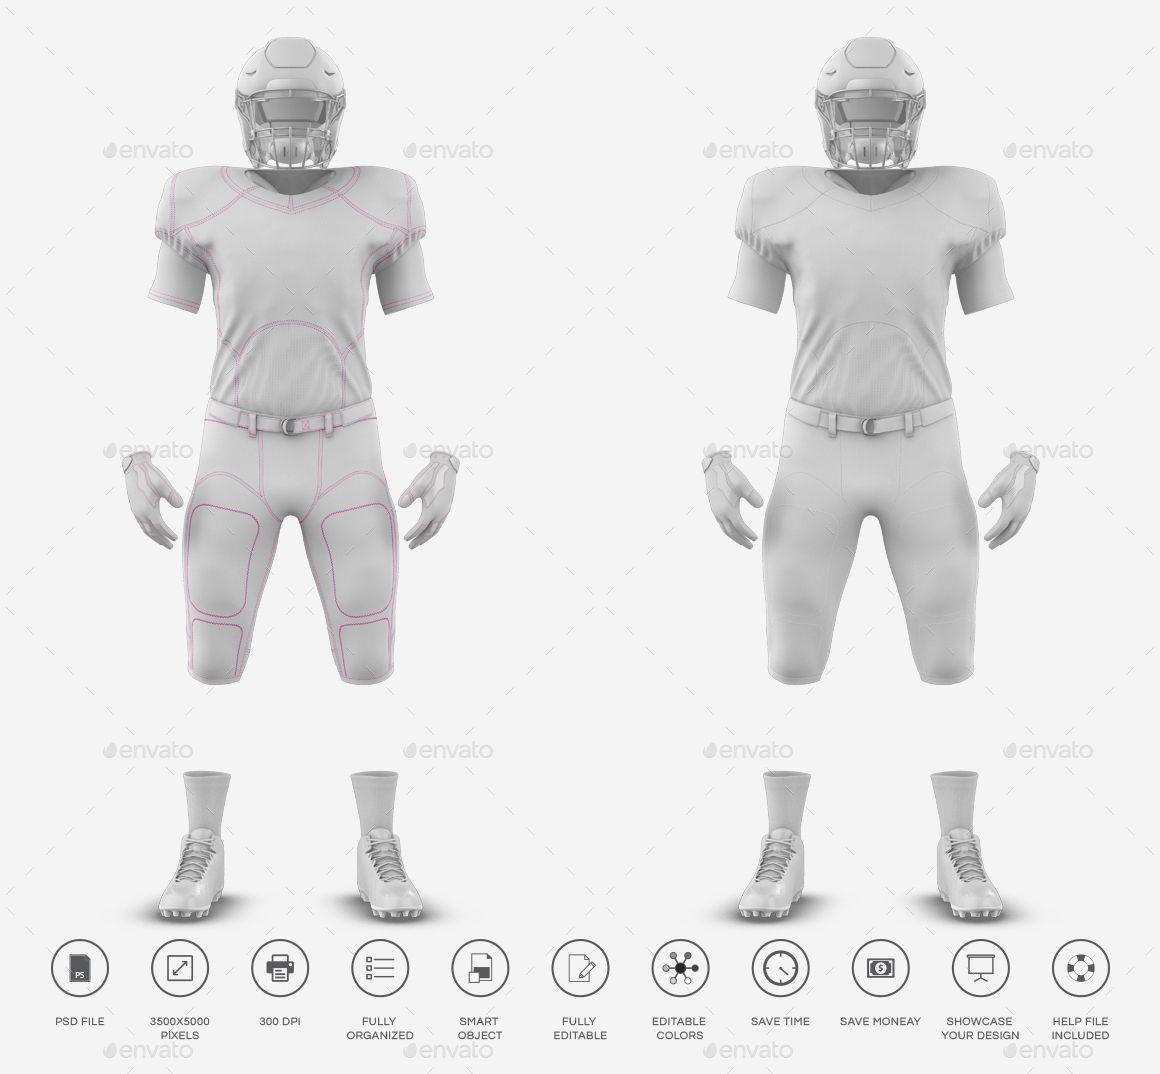 Download American Football Kit Mockup V1 American Football Football Kits Football Free Mockups